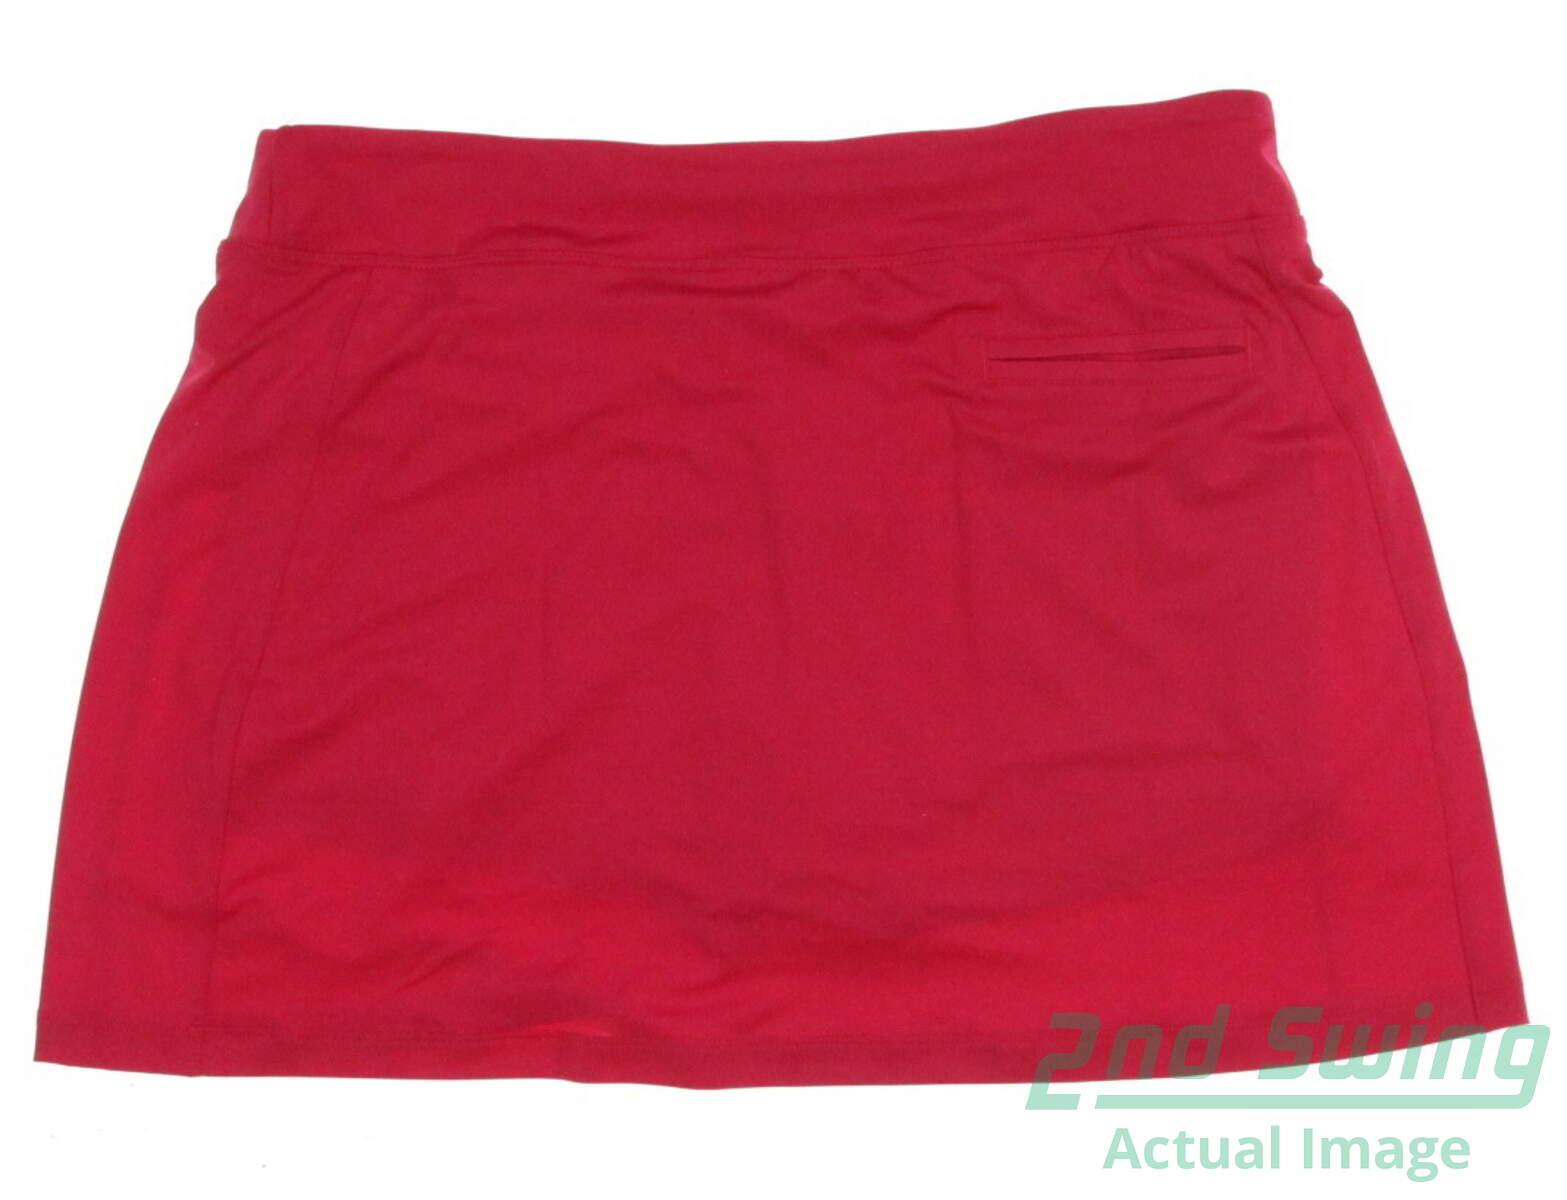 New Womens Puma Golf Solid Knit Skort Size Medium M Rose Red MSRP $55 570561  07